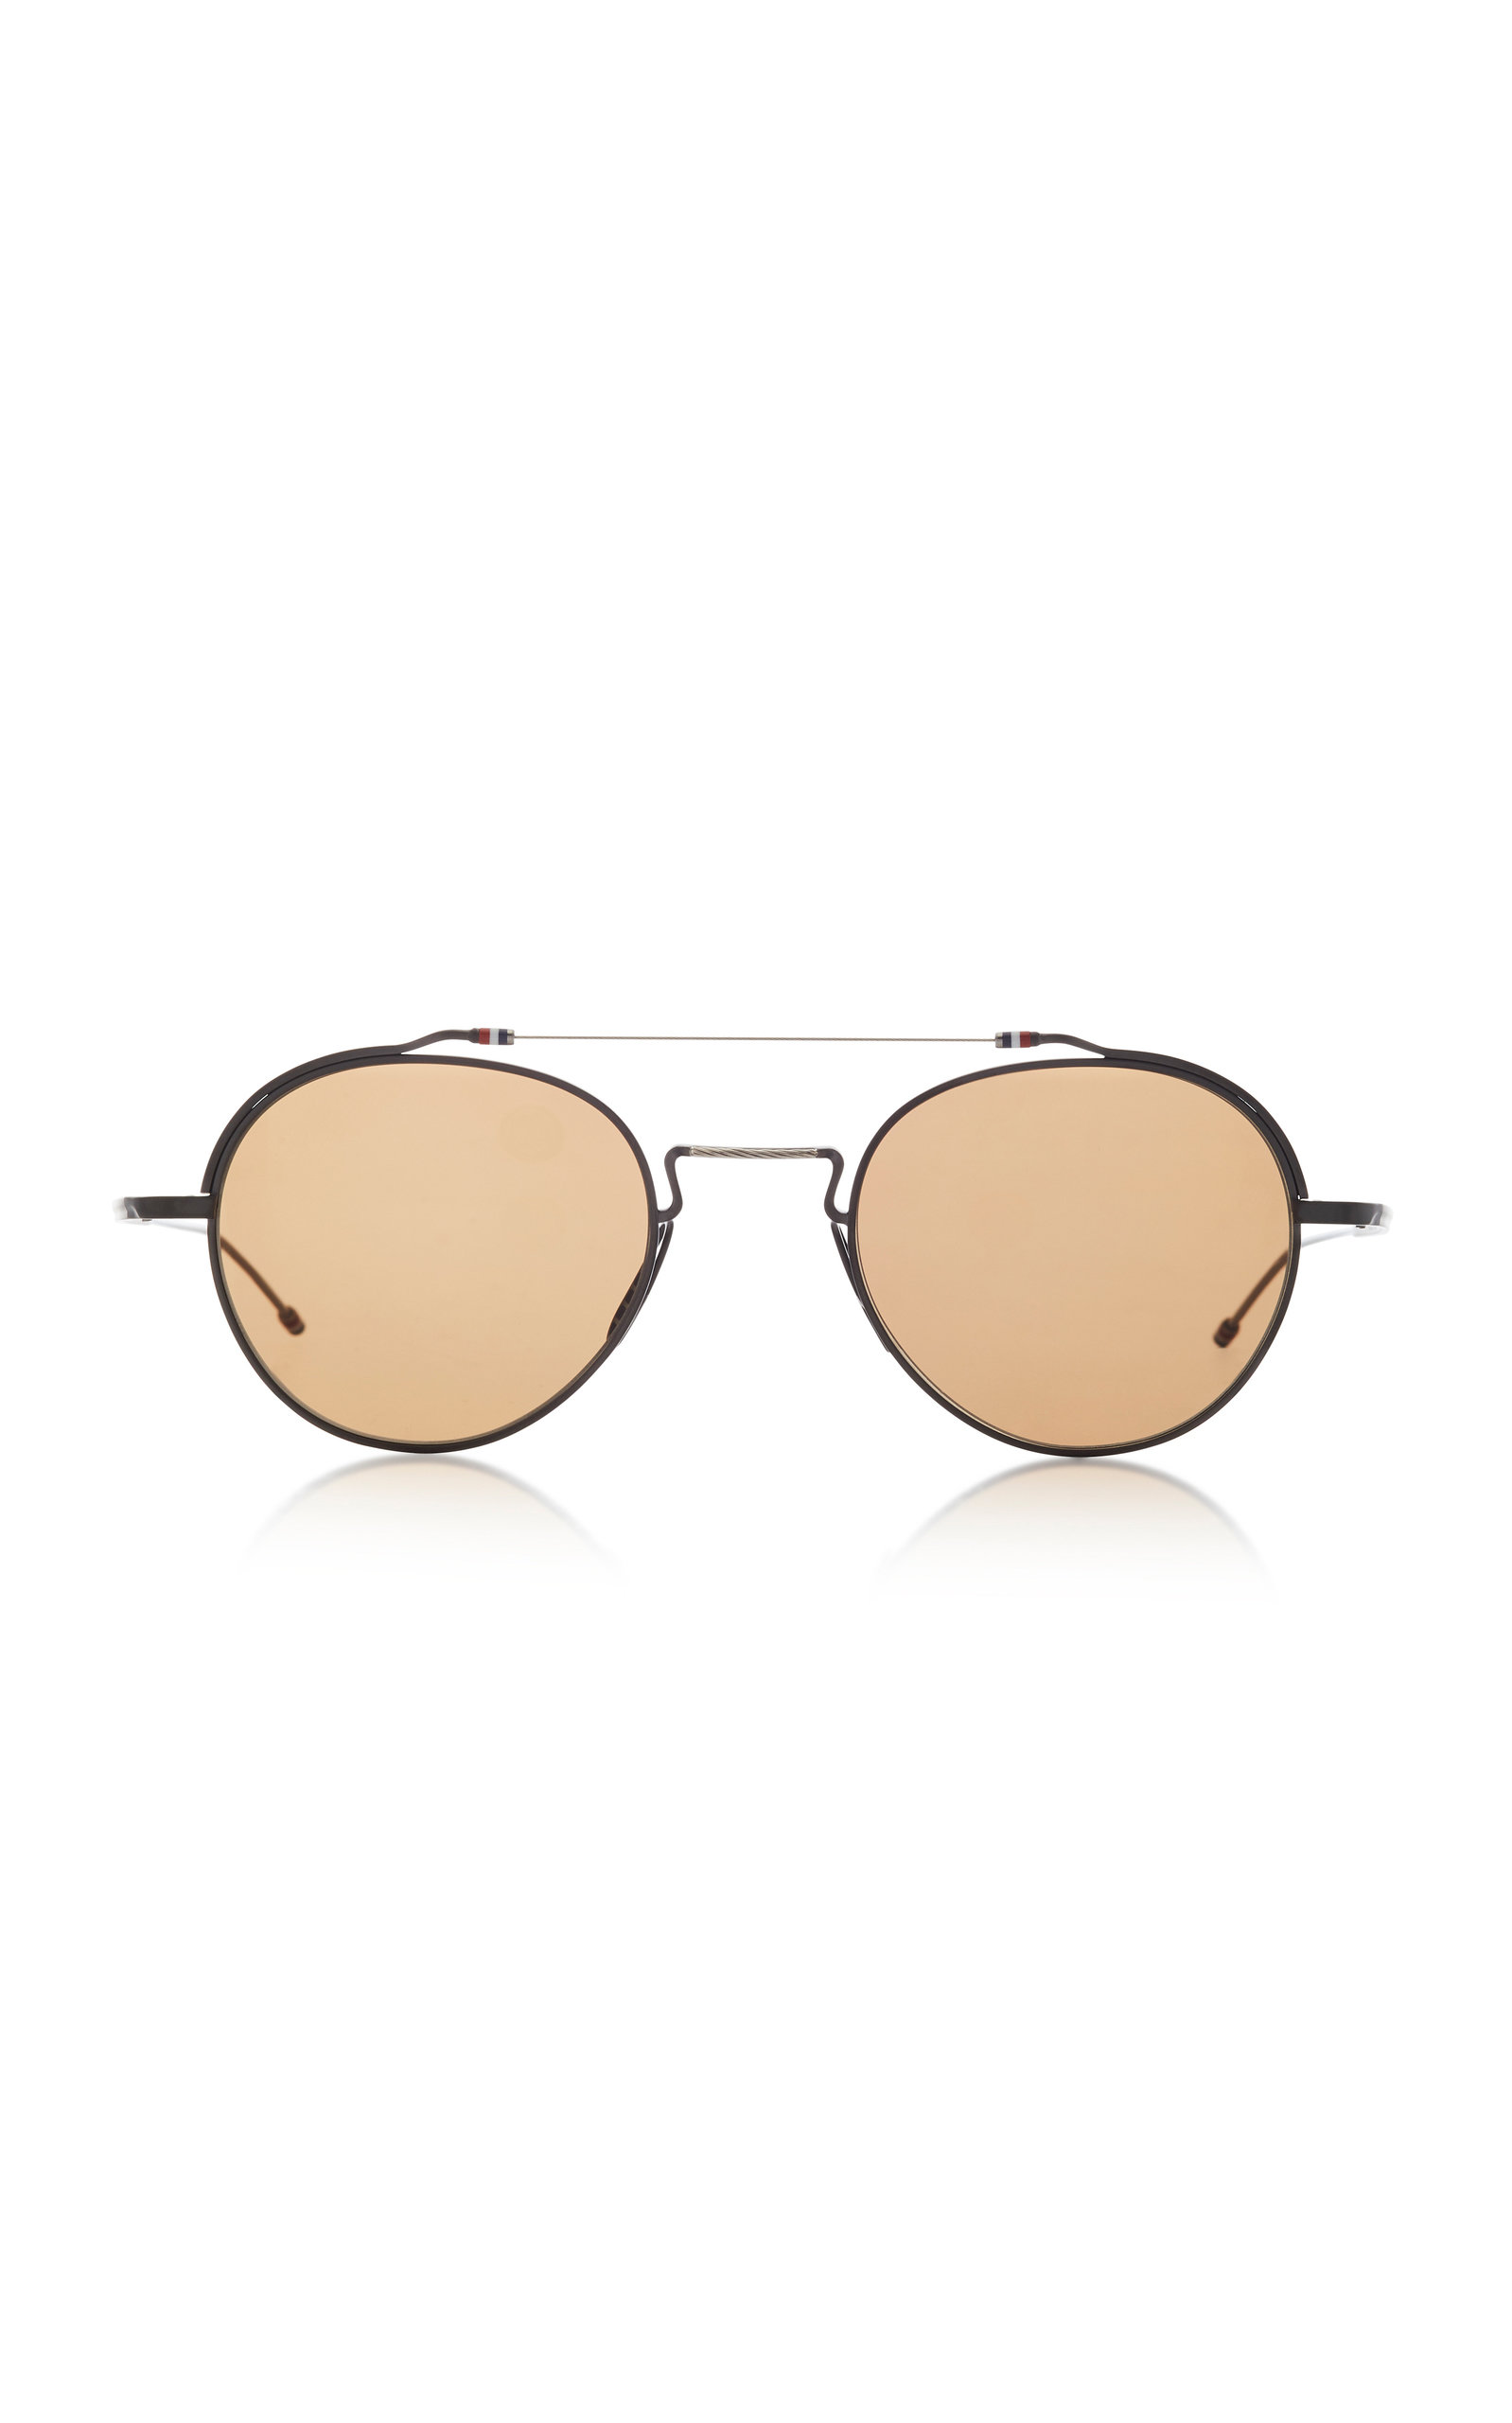 ffdaad65c4b8 Round-Frame Metal Sunglasses by Thom Browne Sun